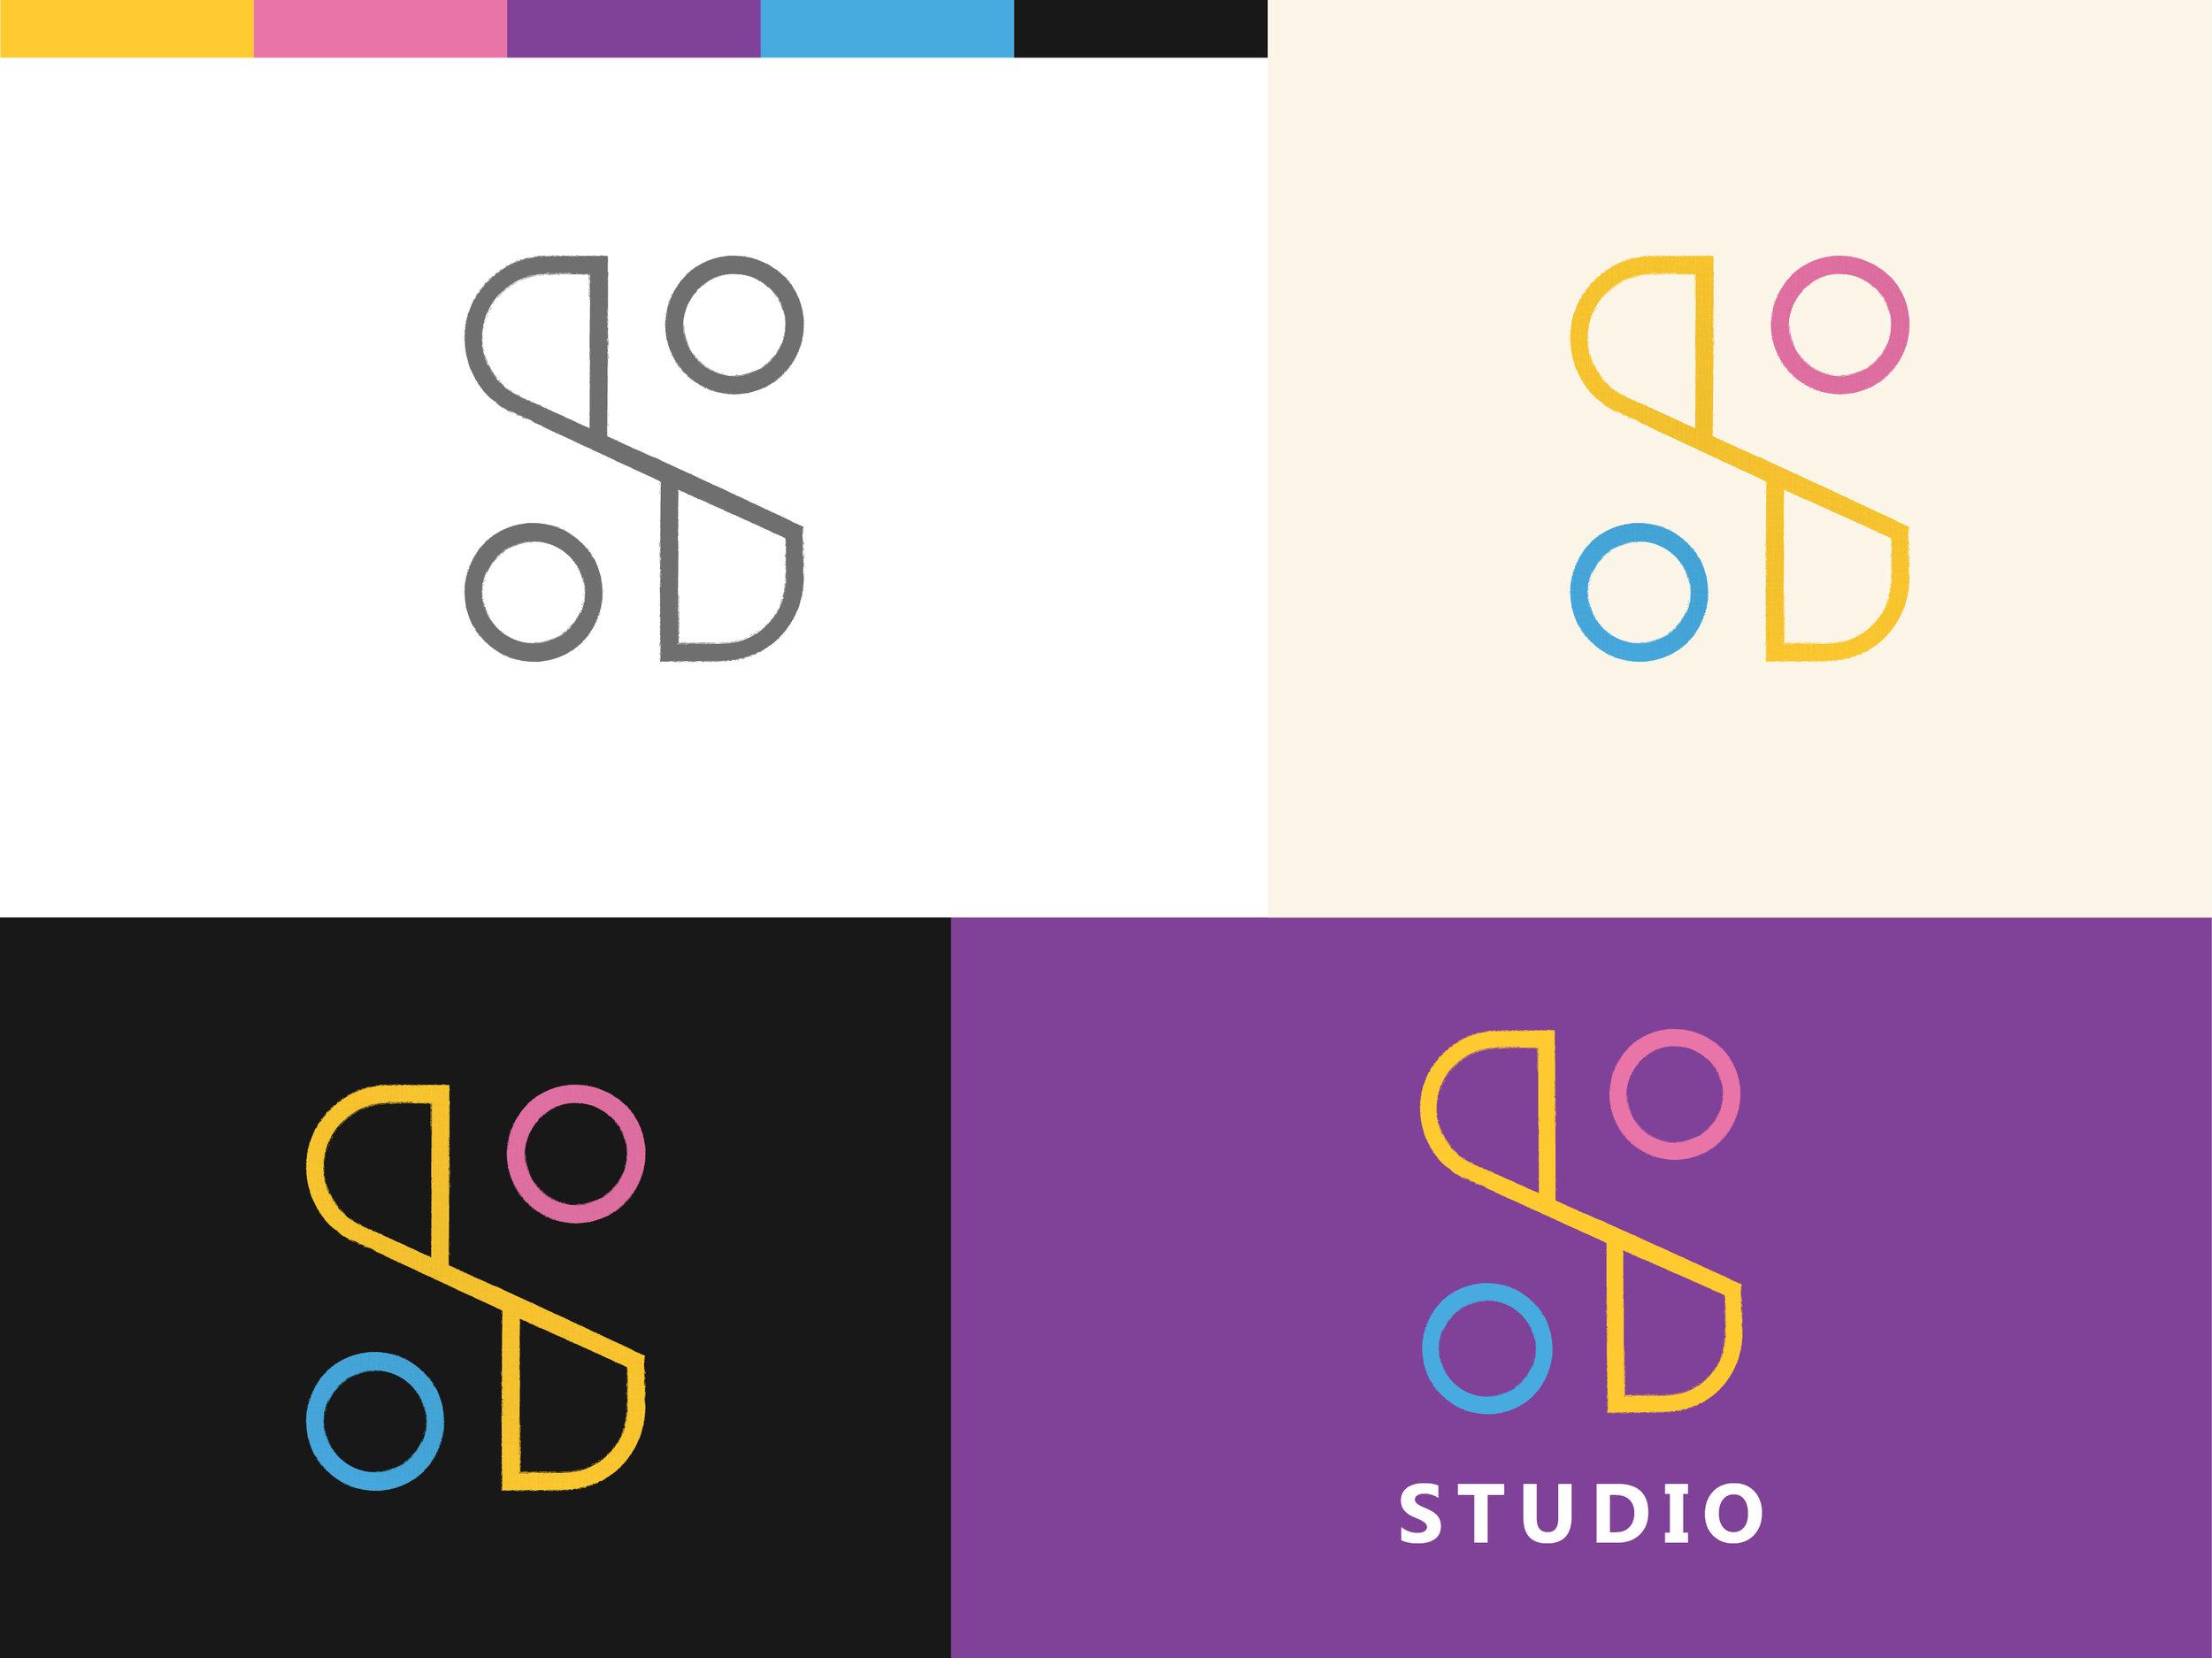 Studio Brand Identity Exploration, Studio